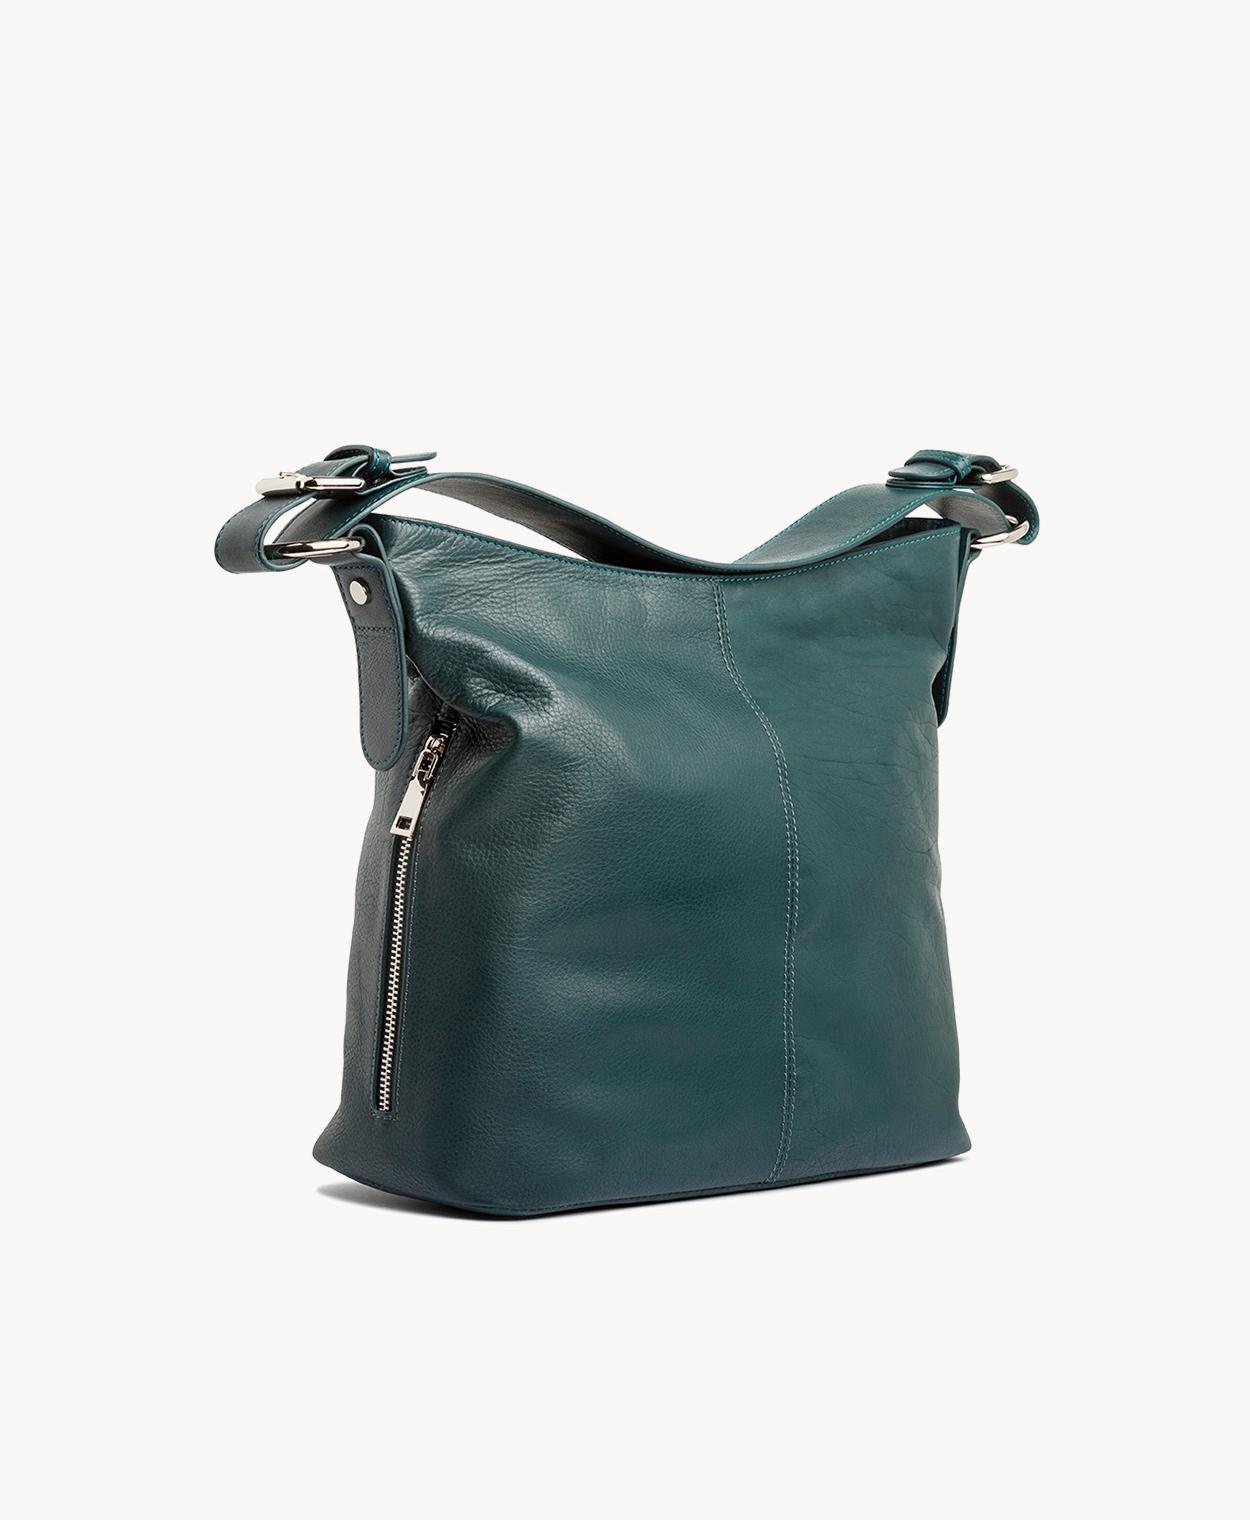 db66ccd35e98 Womens Handbags Online